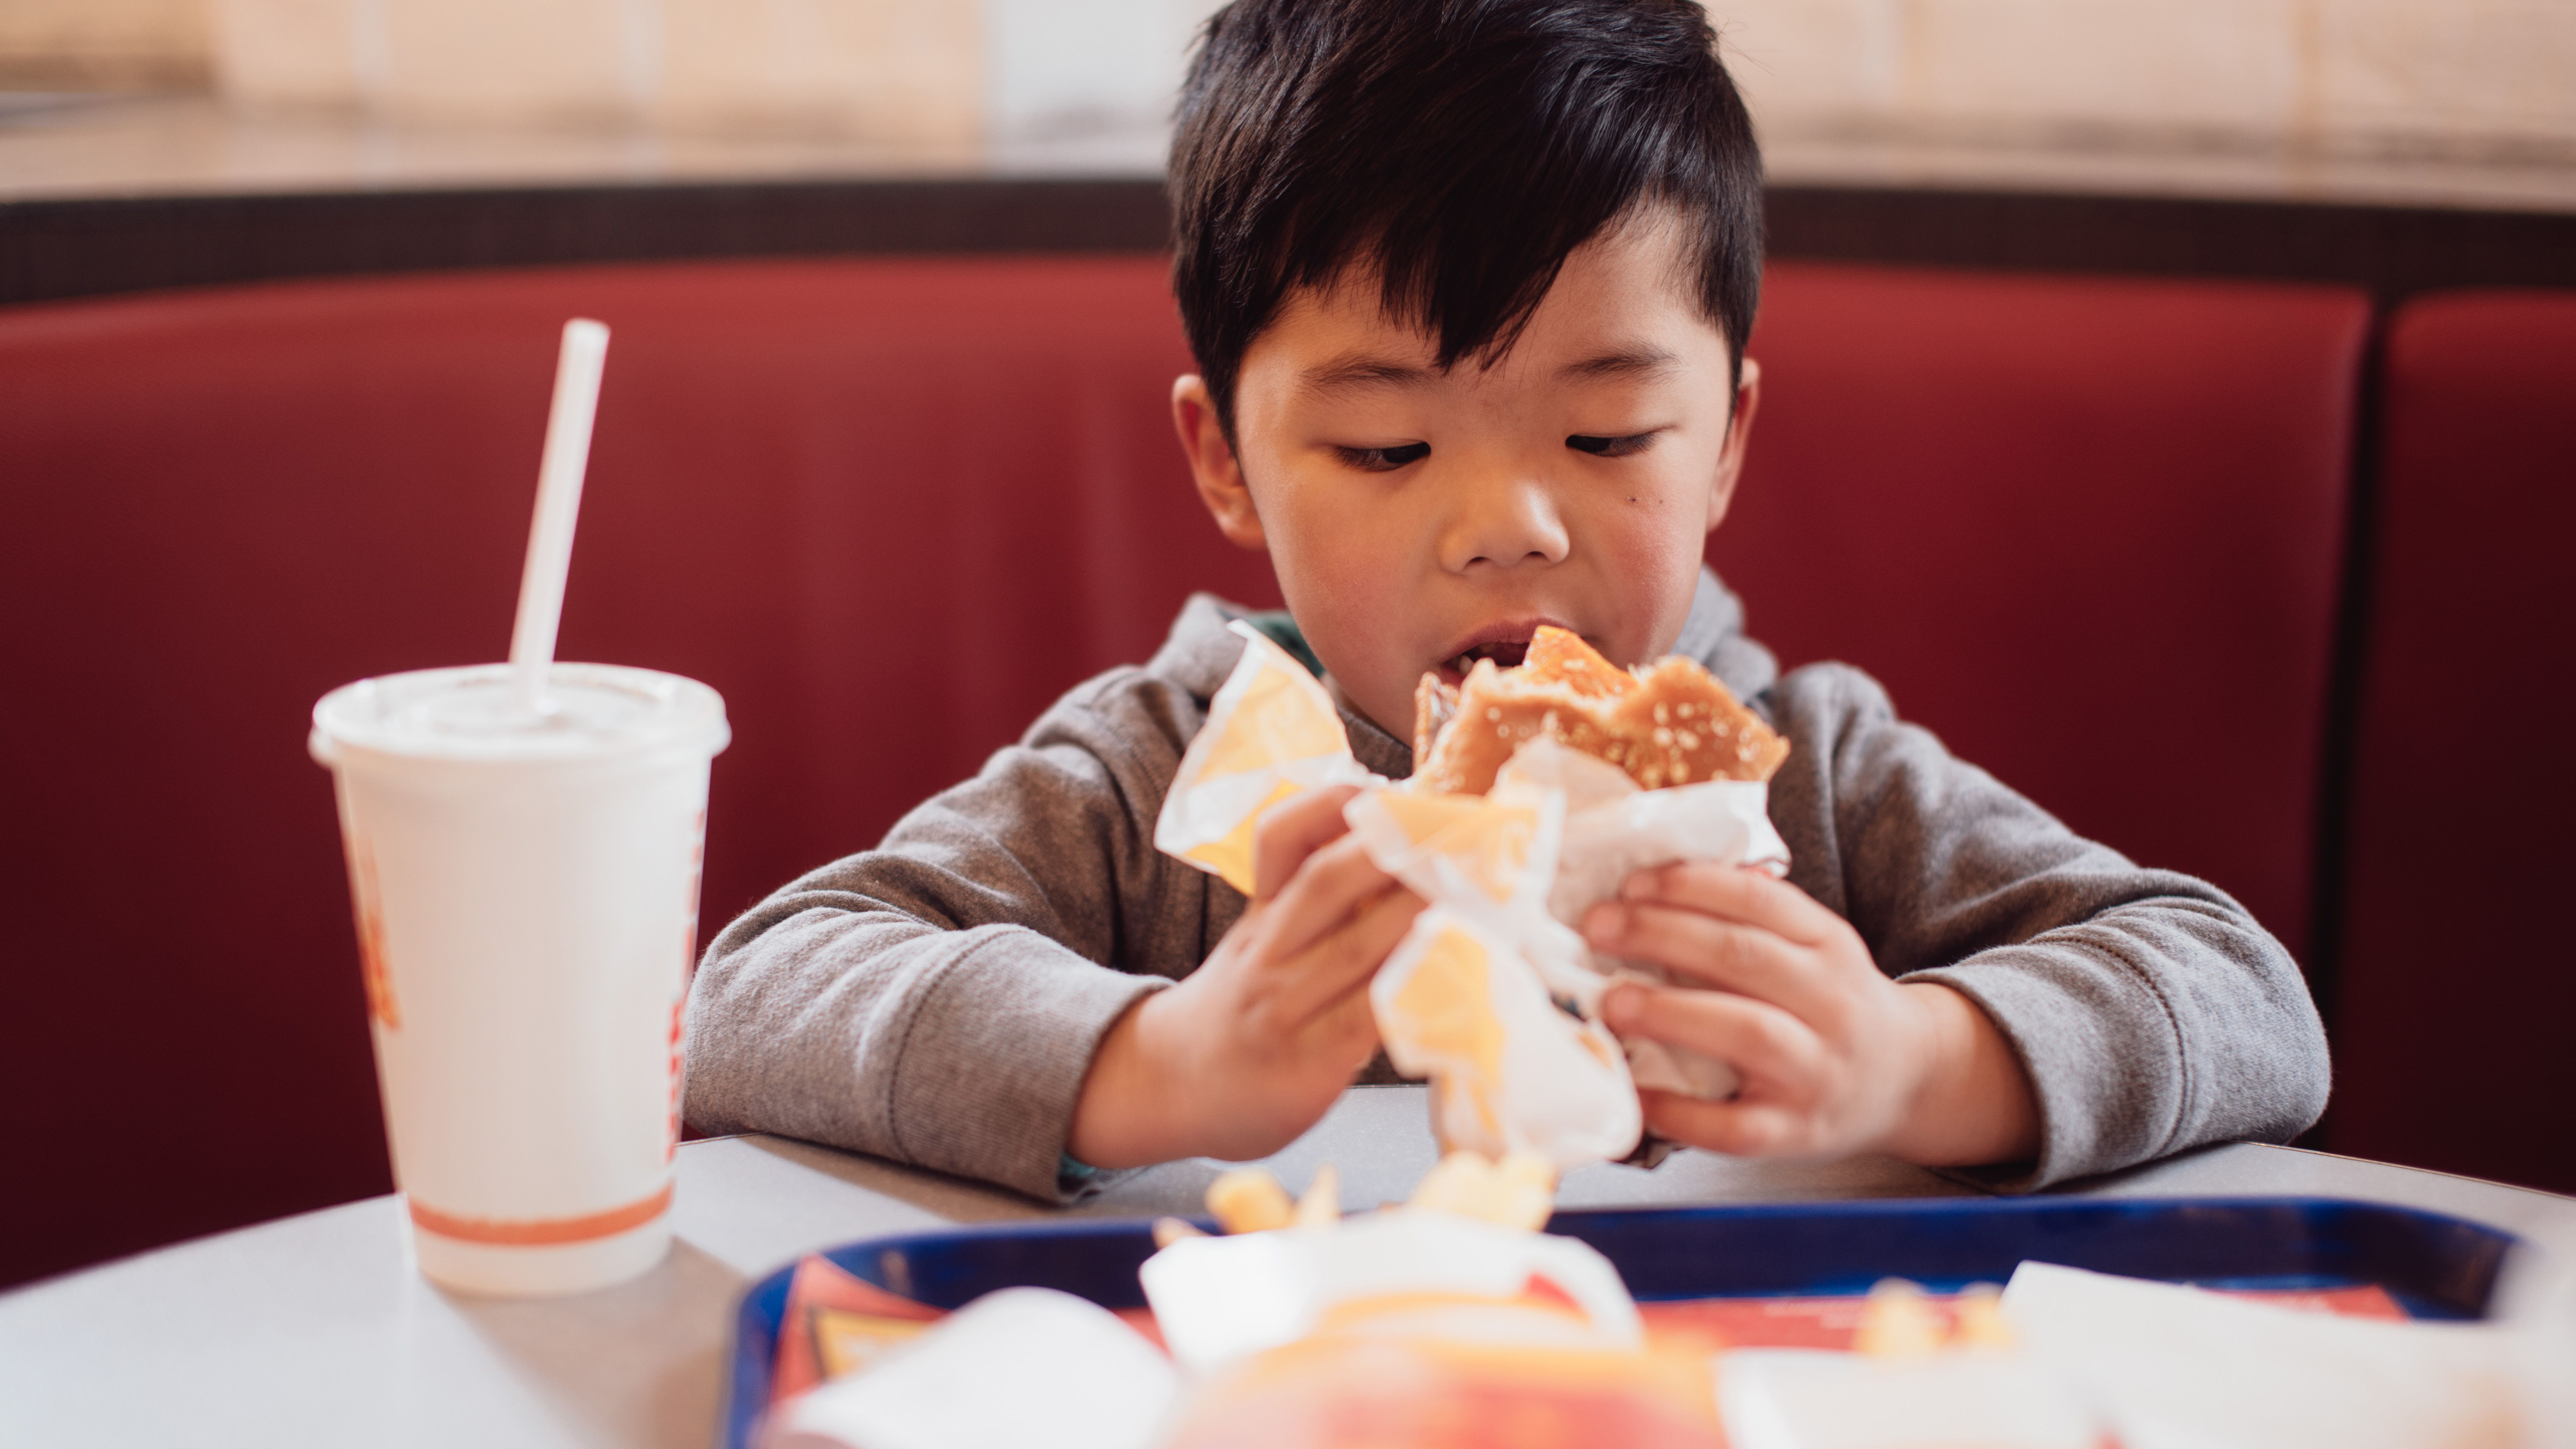 McDonald's Happy Meal Nutrition Information